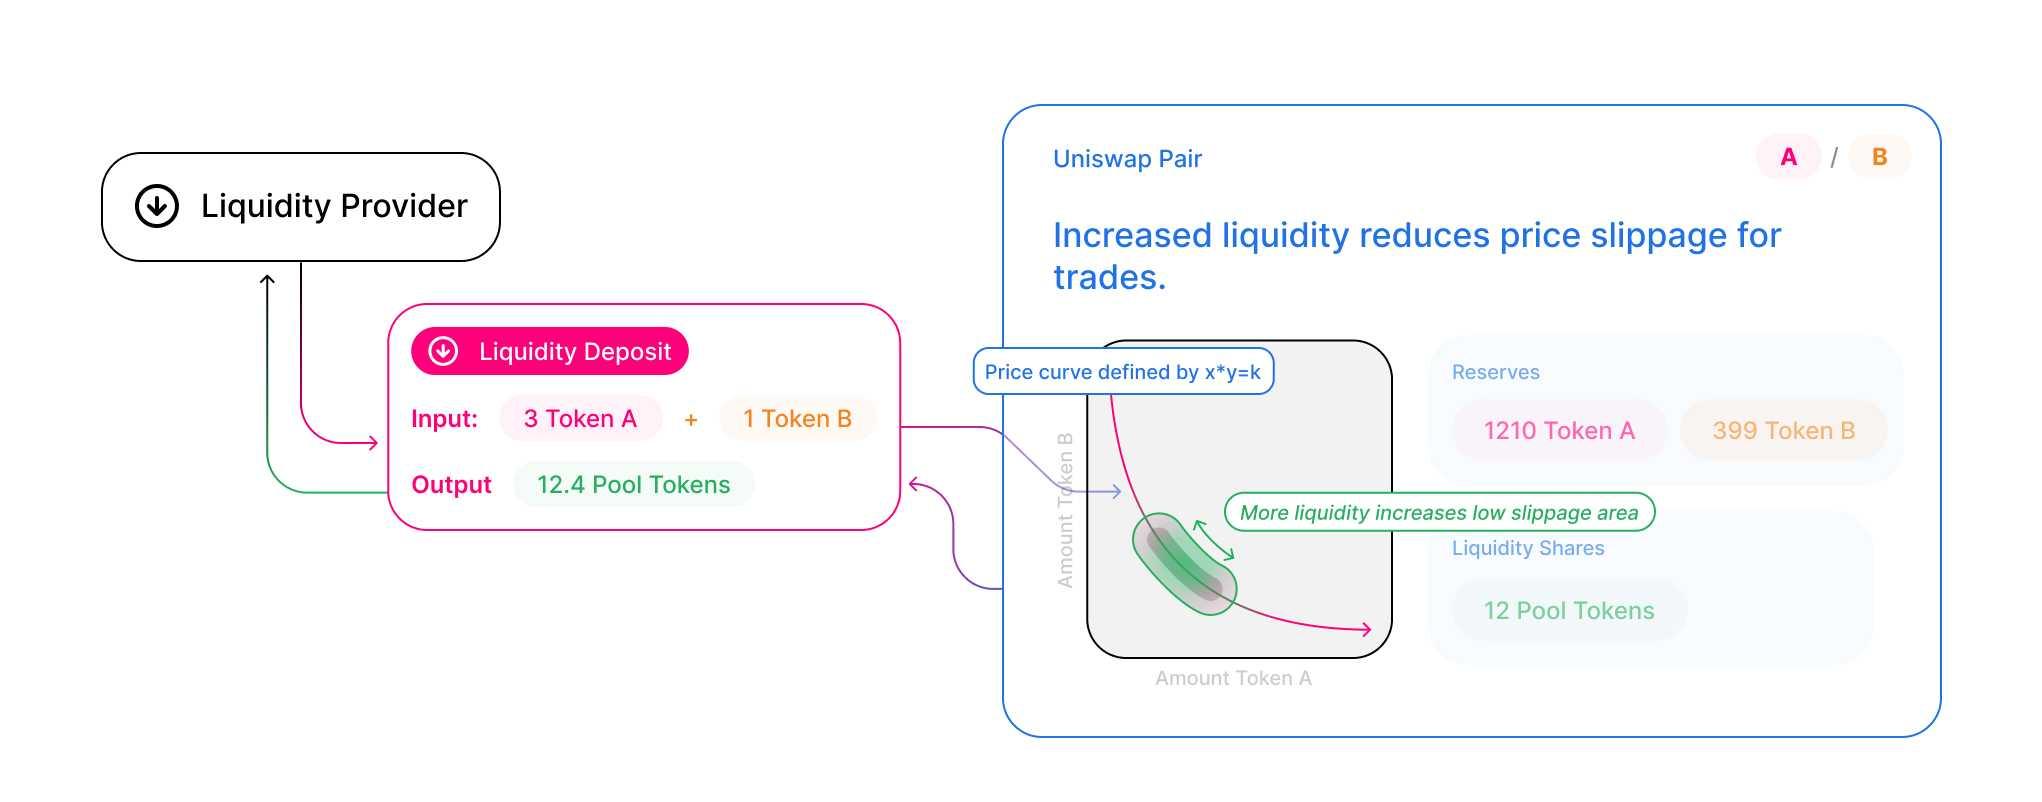 Uniswap (UNI) Funktionsweise Liquiditypools